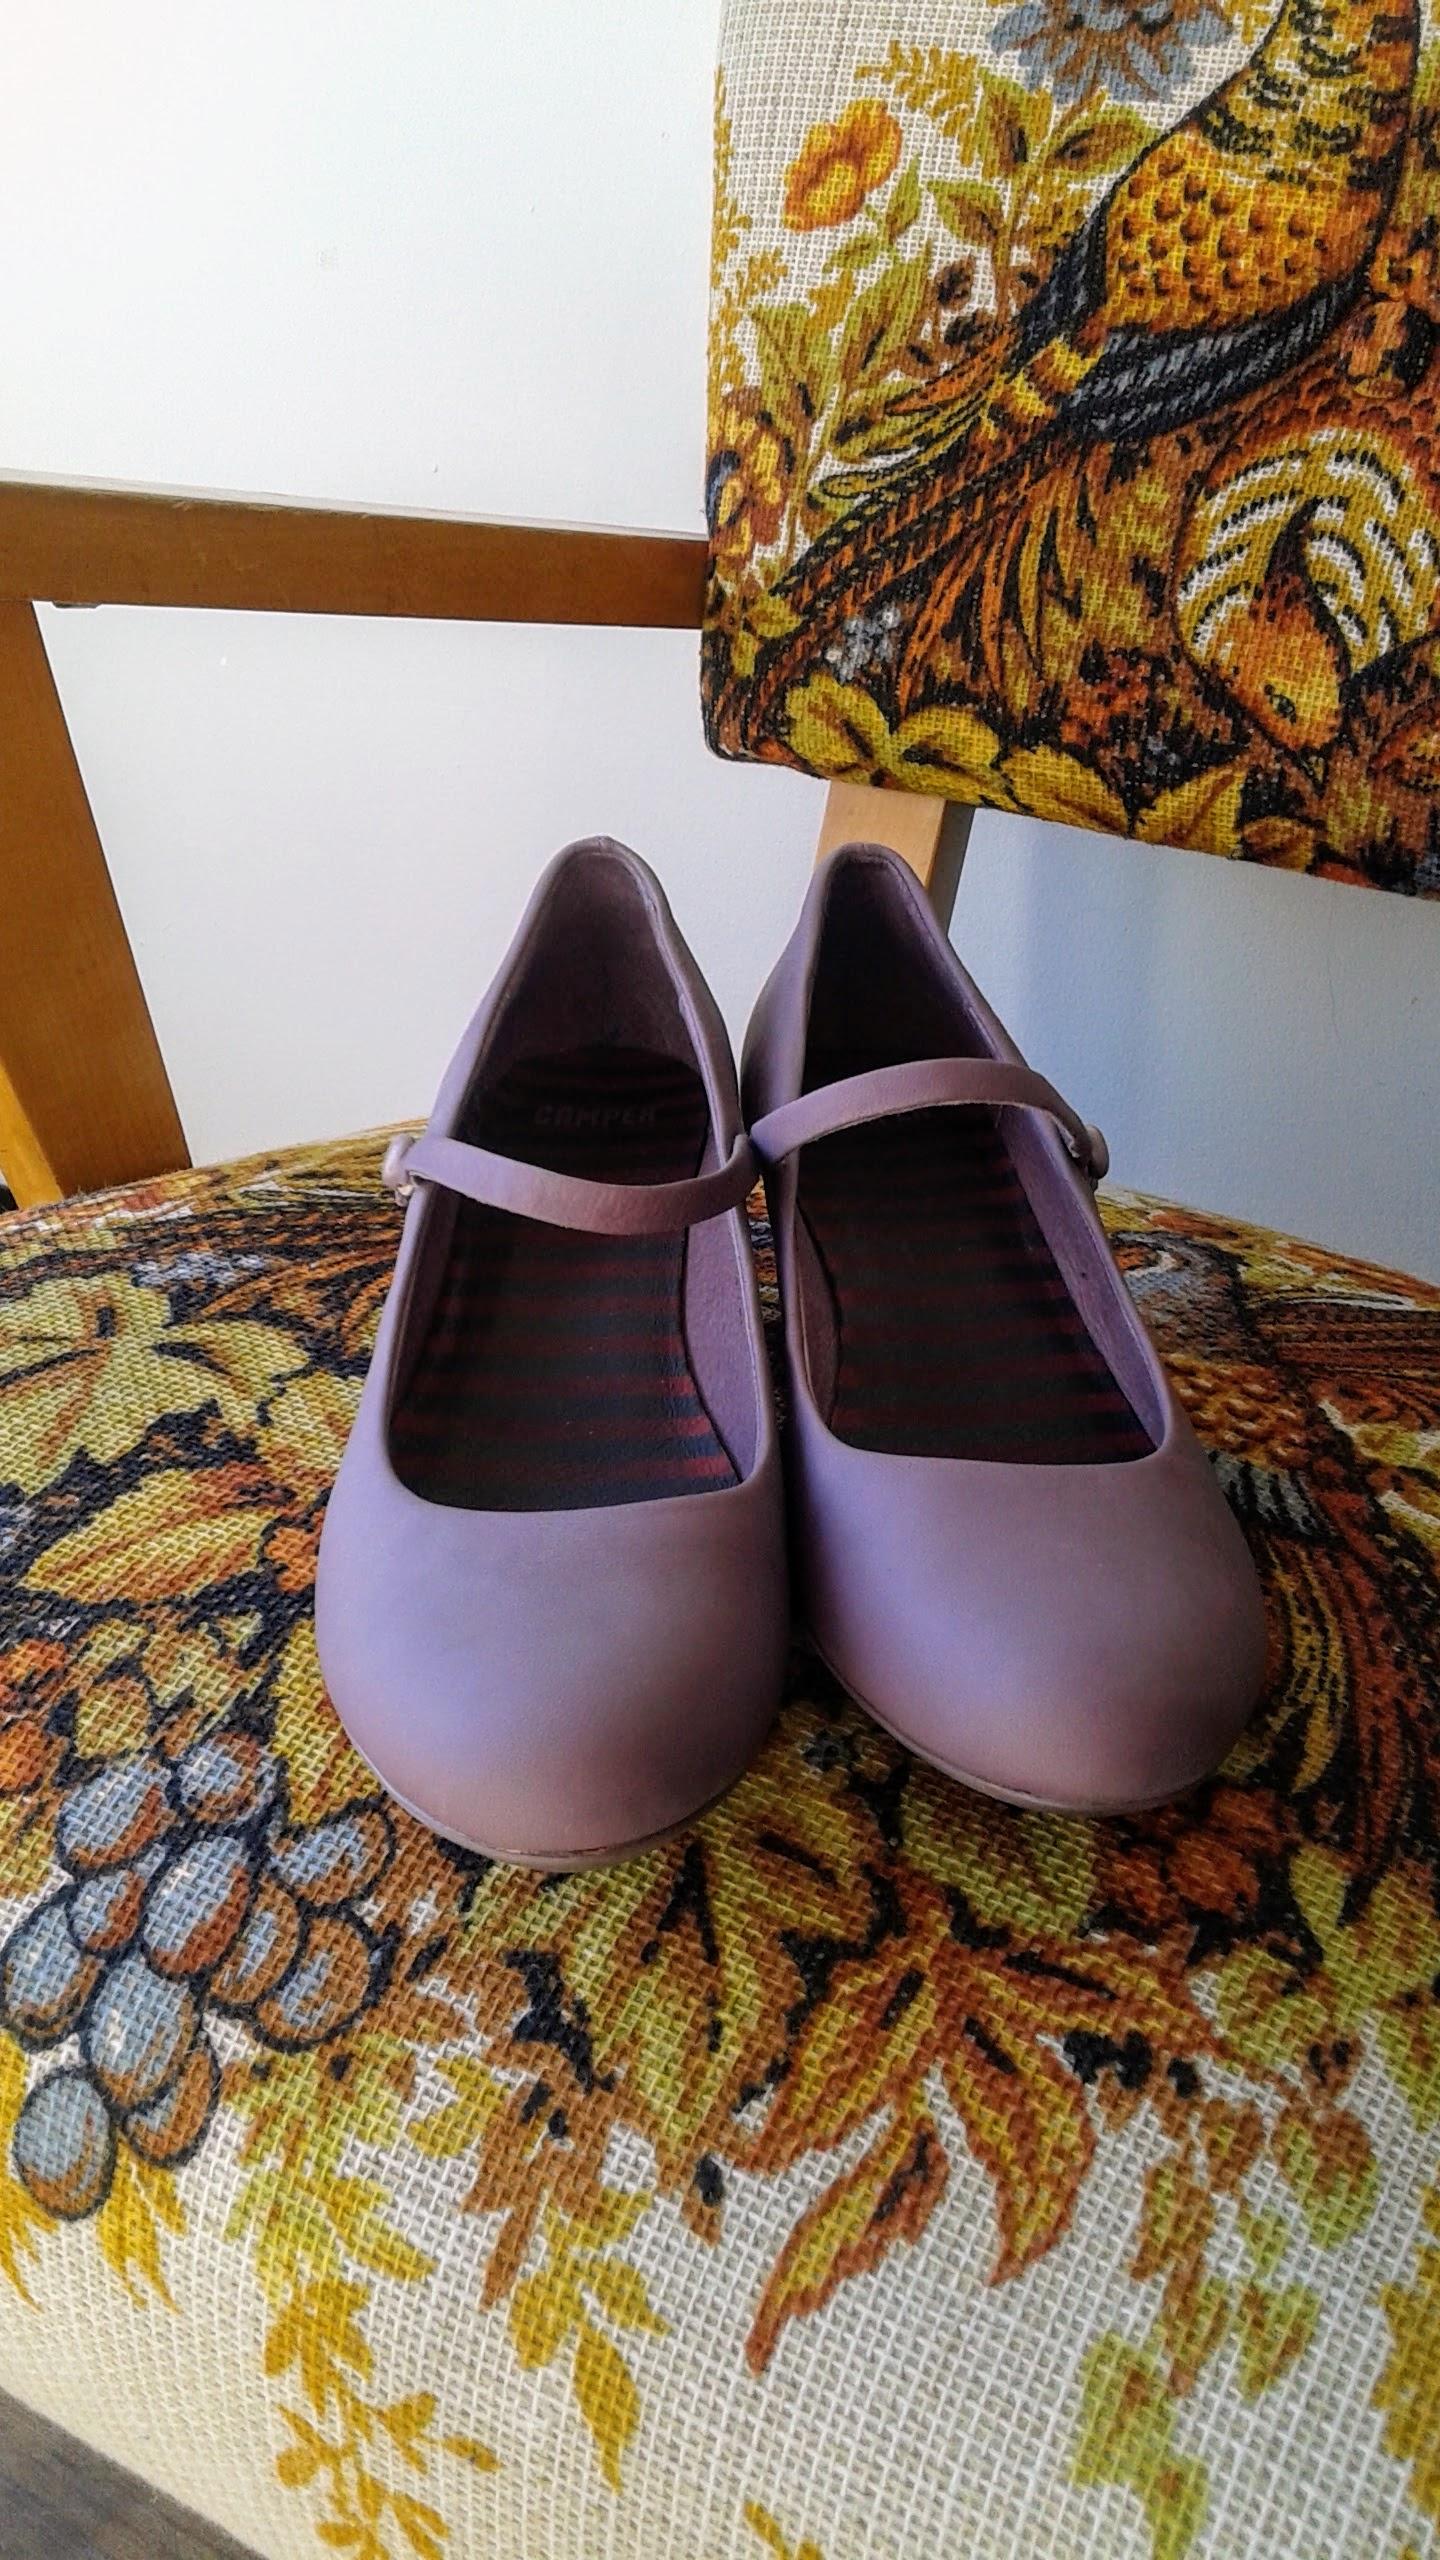 Camper shoes; S7, $48